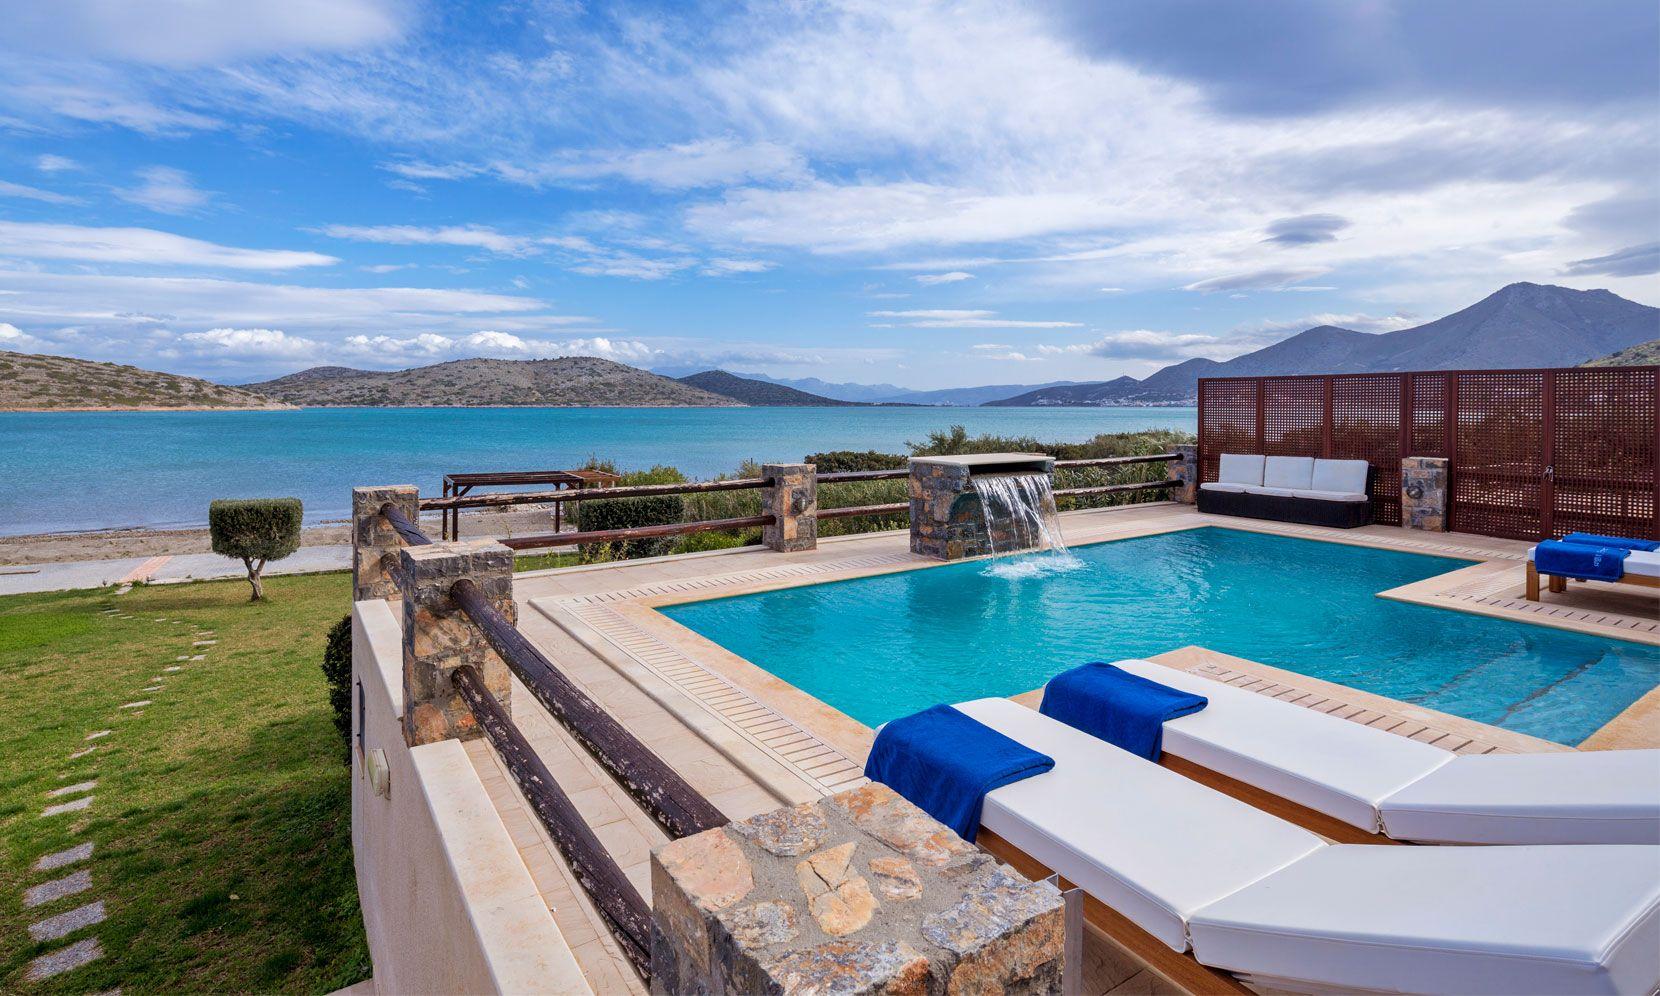 Crete Villa Aineias jumbotron image